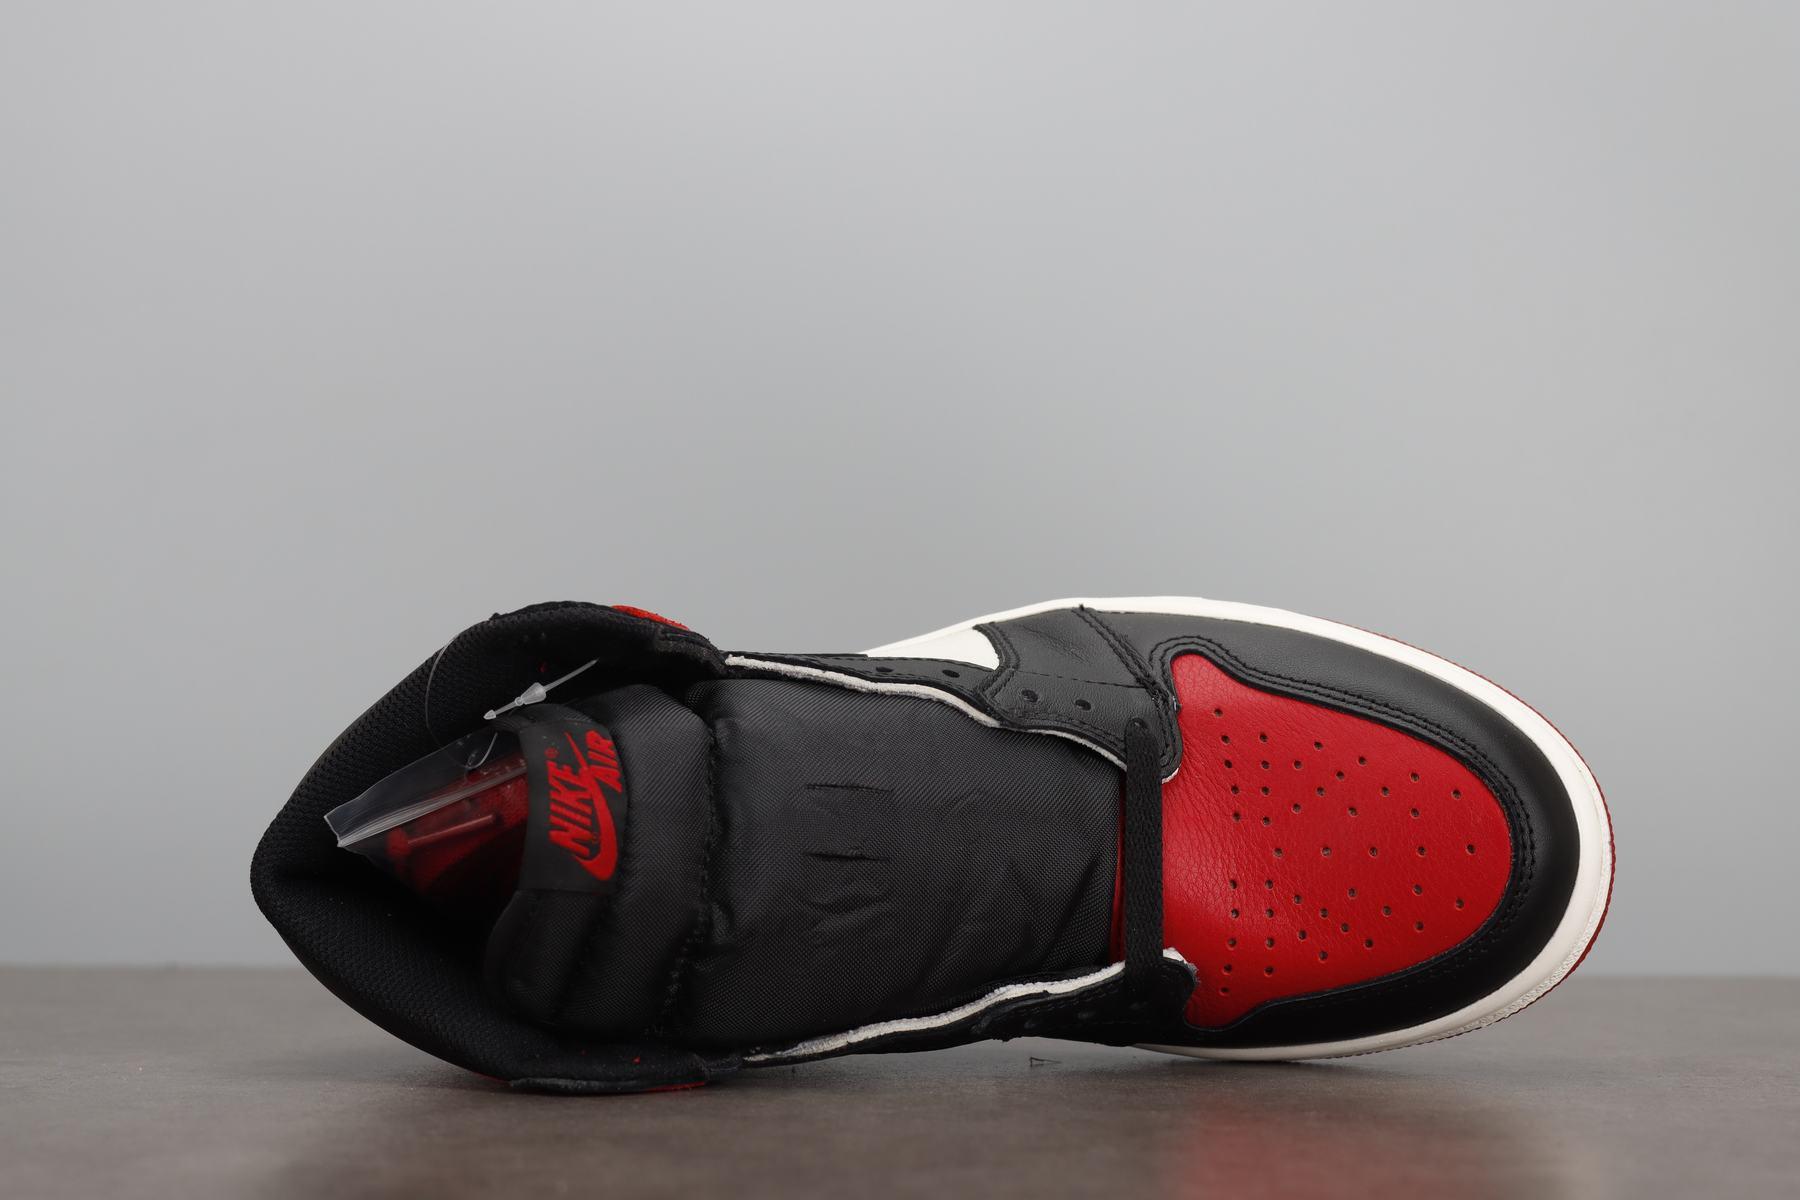 LJR版本 Air Jordan 1 OG Bred Toe AJ1黑红脚趾 555088-610_ljr版本去哪里买